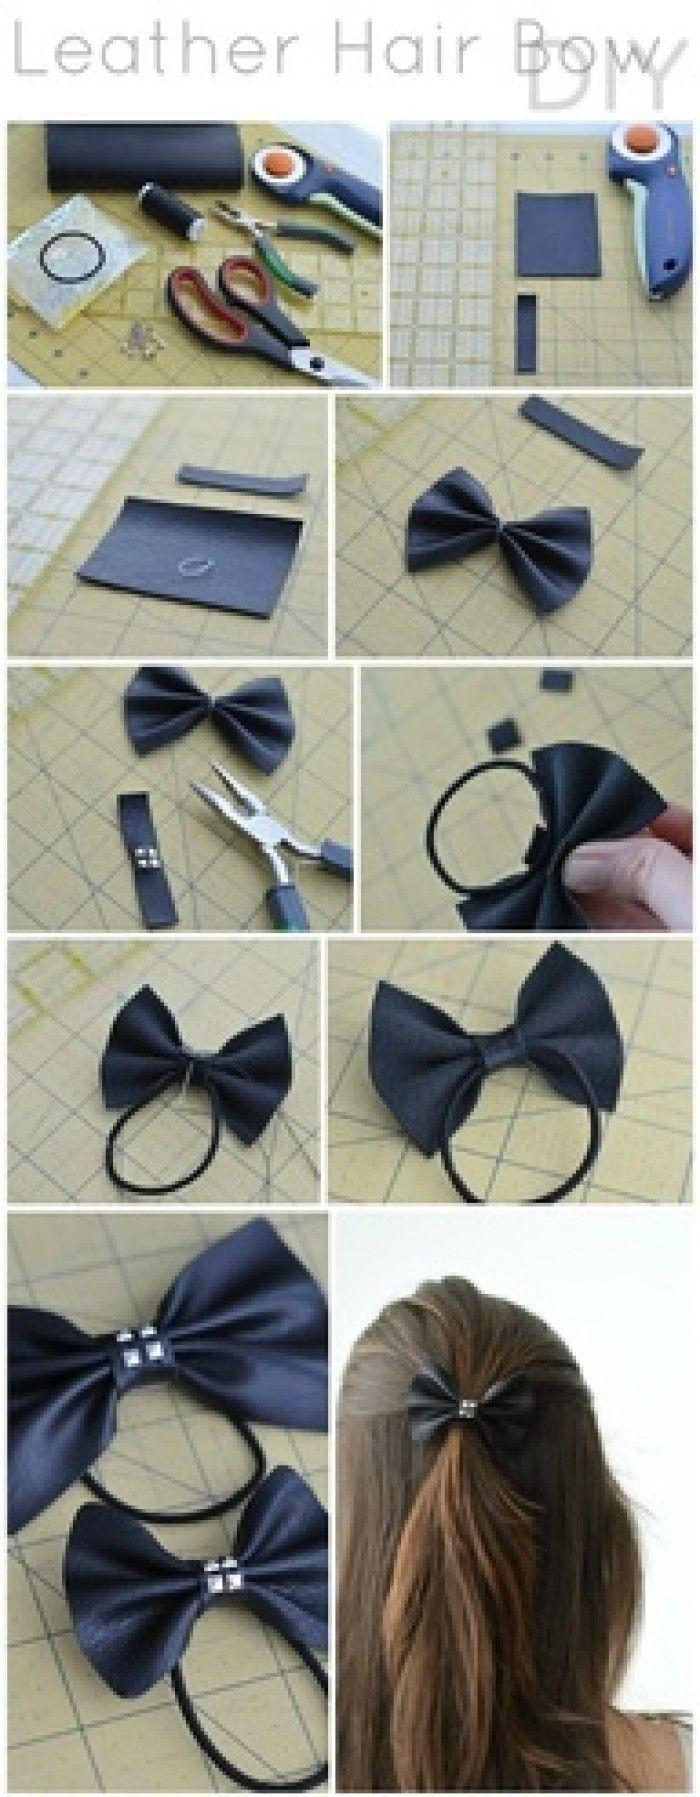 DIY: Moño de cuero / Leather bow. Hair bow. Bow tie.